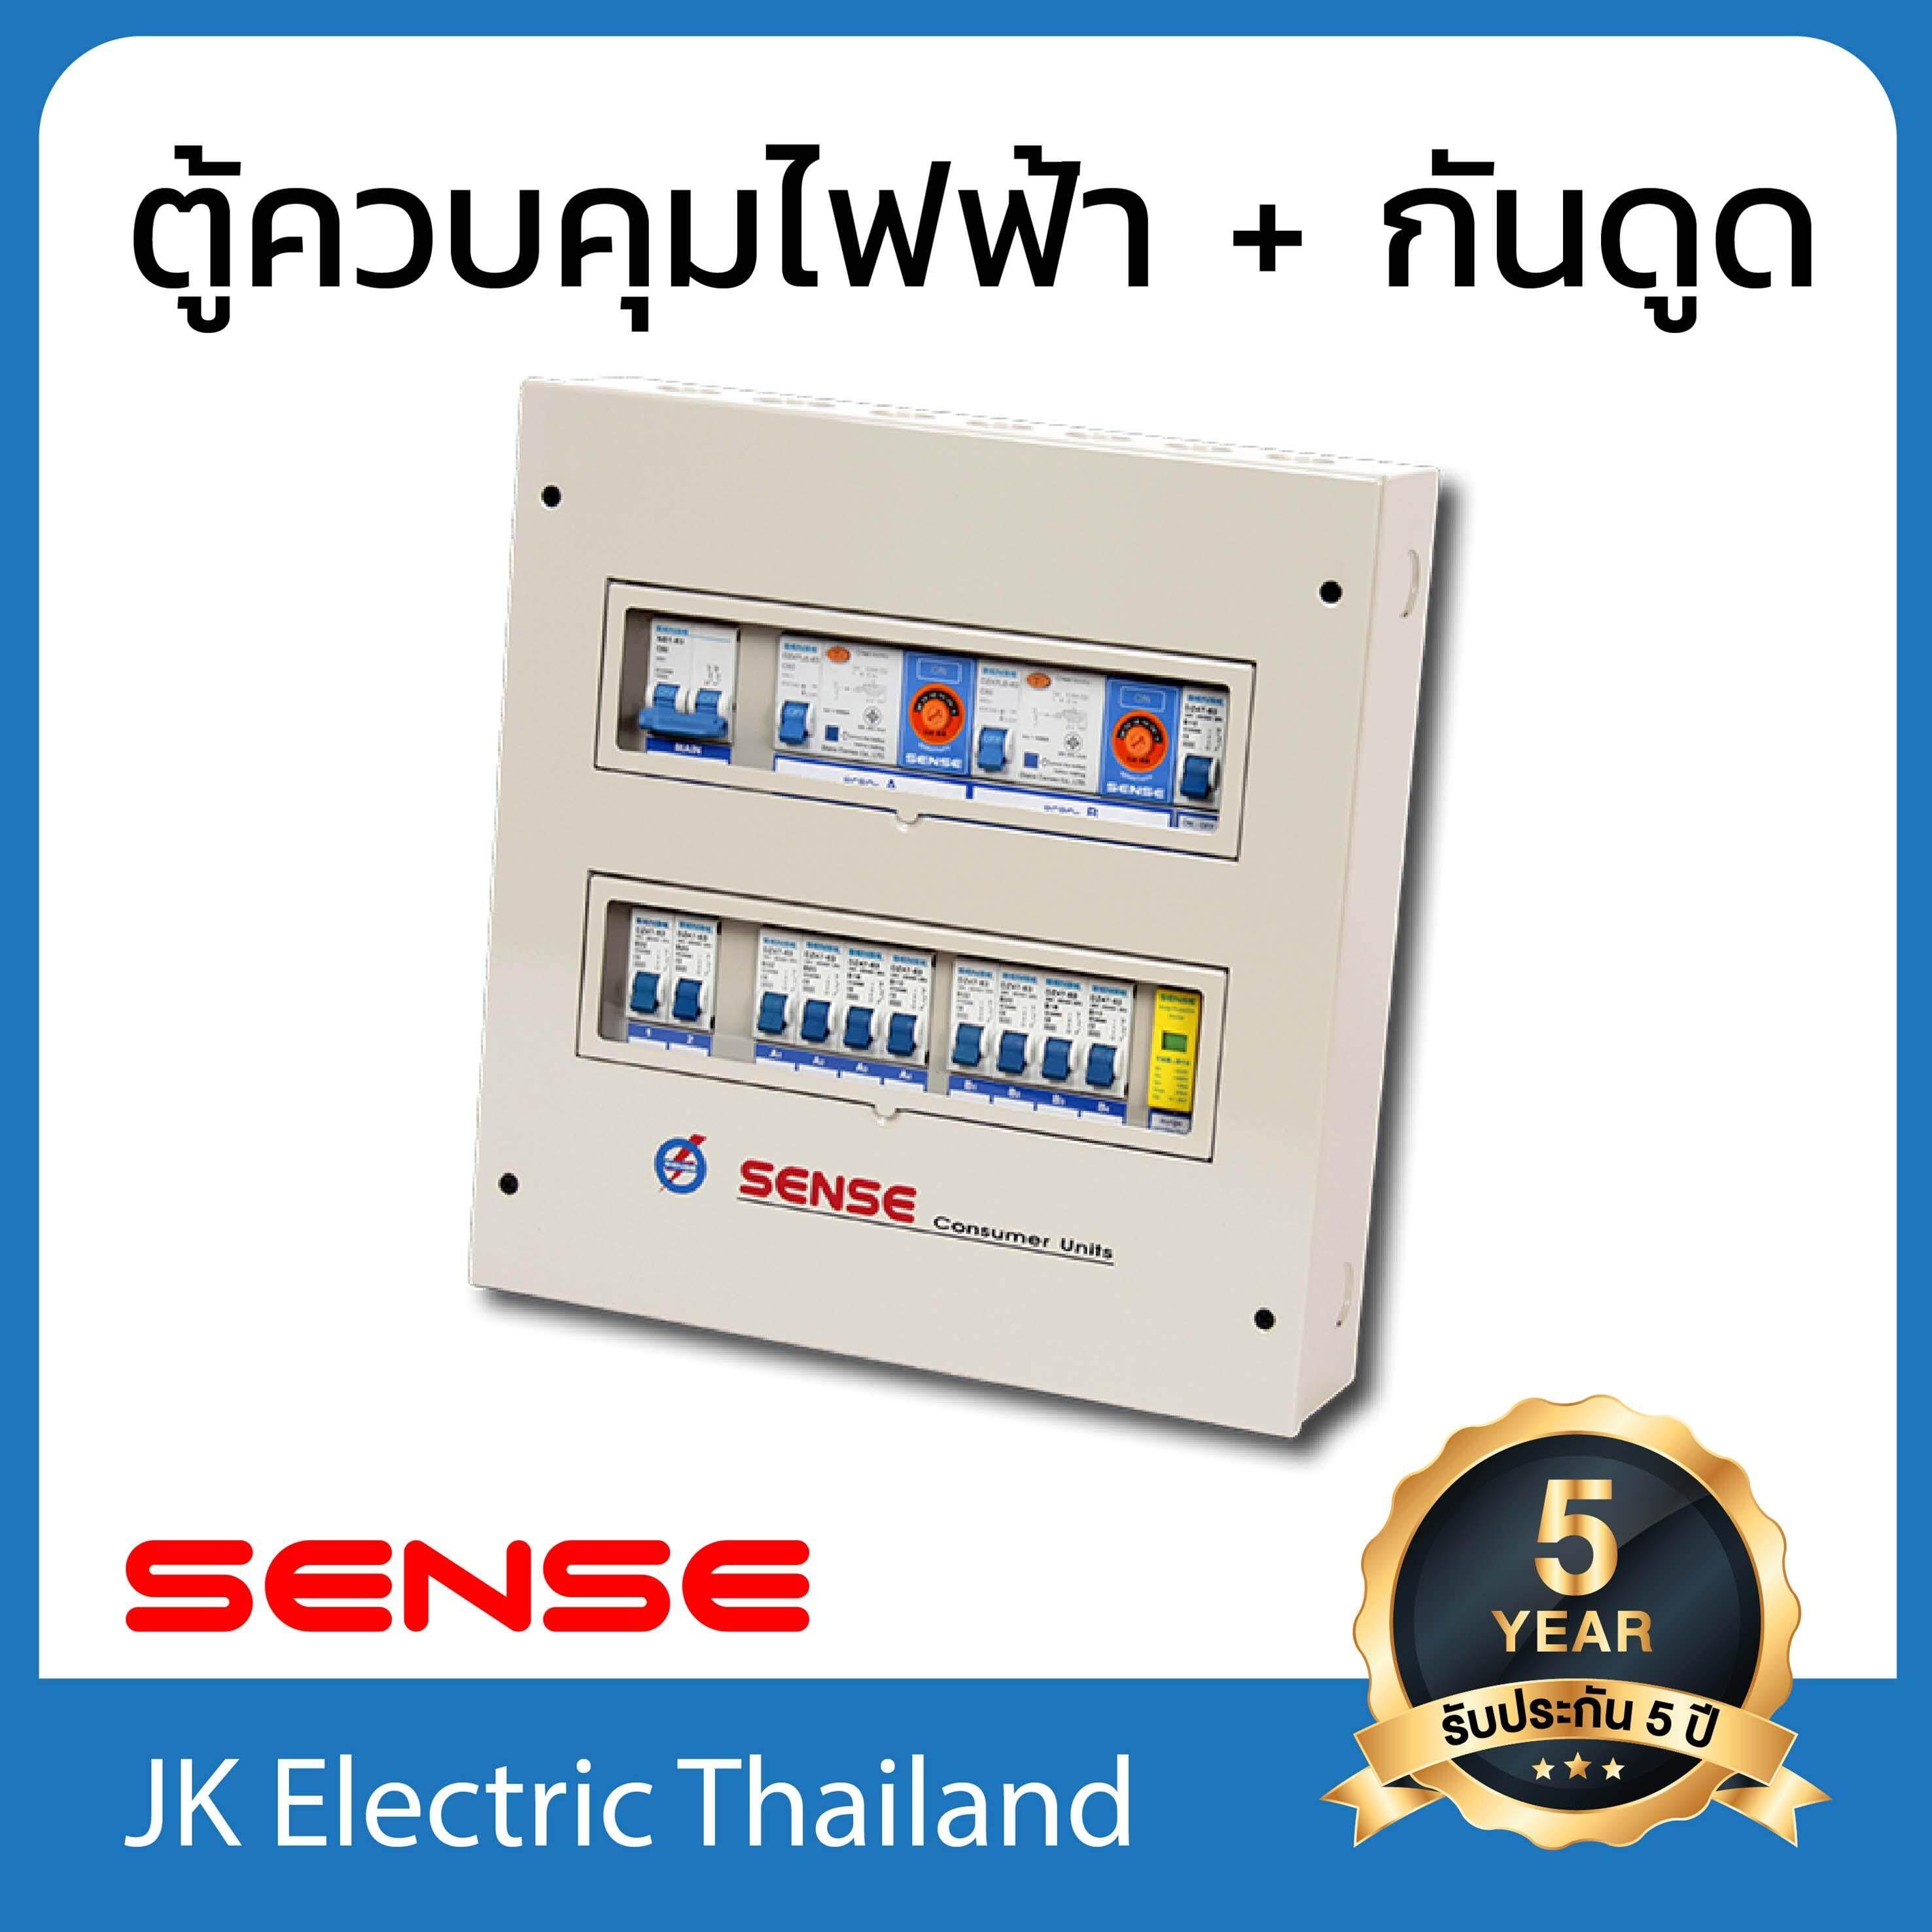 Sense ตู้ไฟ ตู้ควบคุมไฟฟ้า ตู้คอนซูมเมอร์ เซนส์ ชนิดแบ่งกลุ่ม ขนาด 10 ช่อง พร้อม เครื่องตัดไฟรั่ว (rcd) 2 ตัว และ อุปกรณ์ป้องกันฟ้าผ่า (spd) รุ่น R2n (เลือกขนาดเมน 32a, 50a, 63a และลูกย่อย 10a, 16a, 20a, 32a ตามต้องการ).